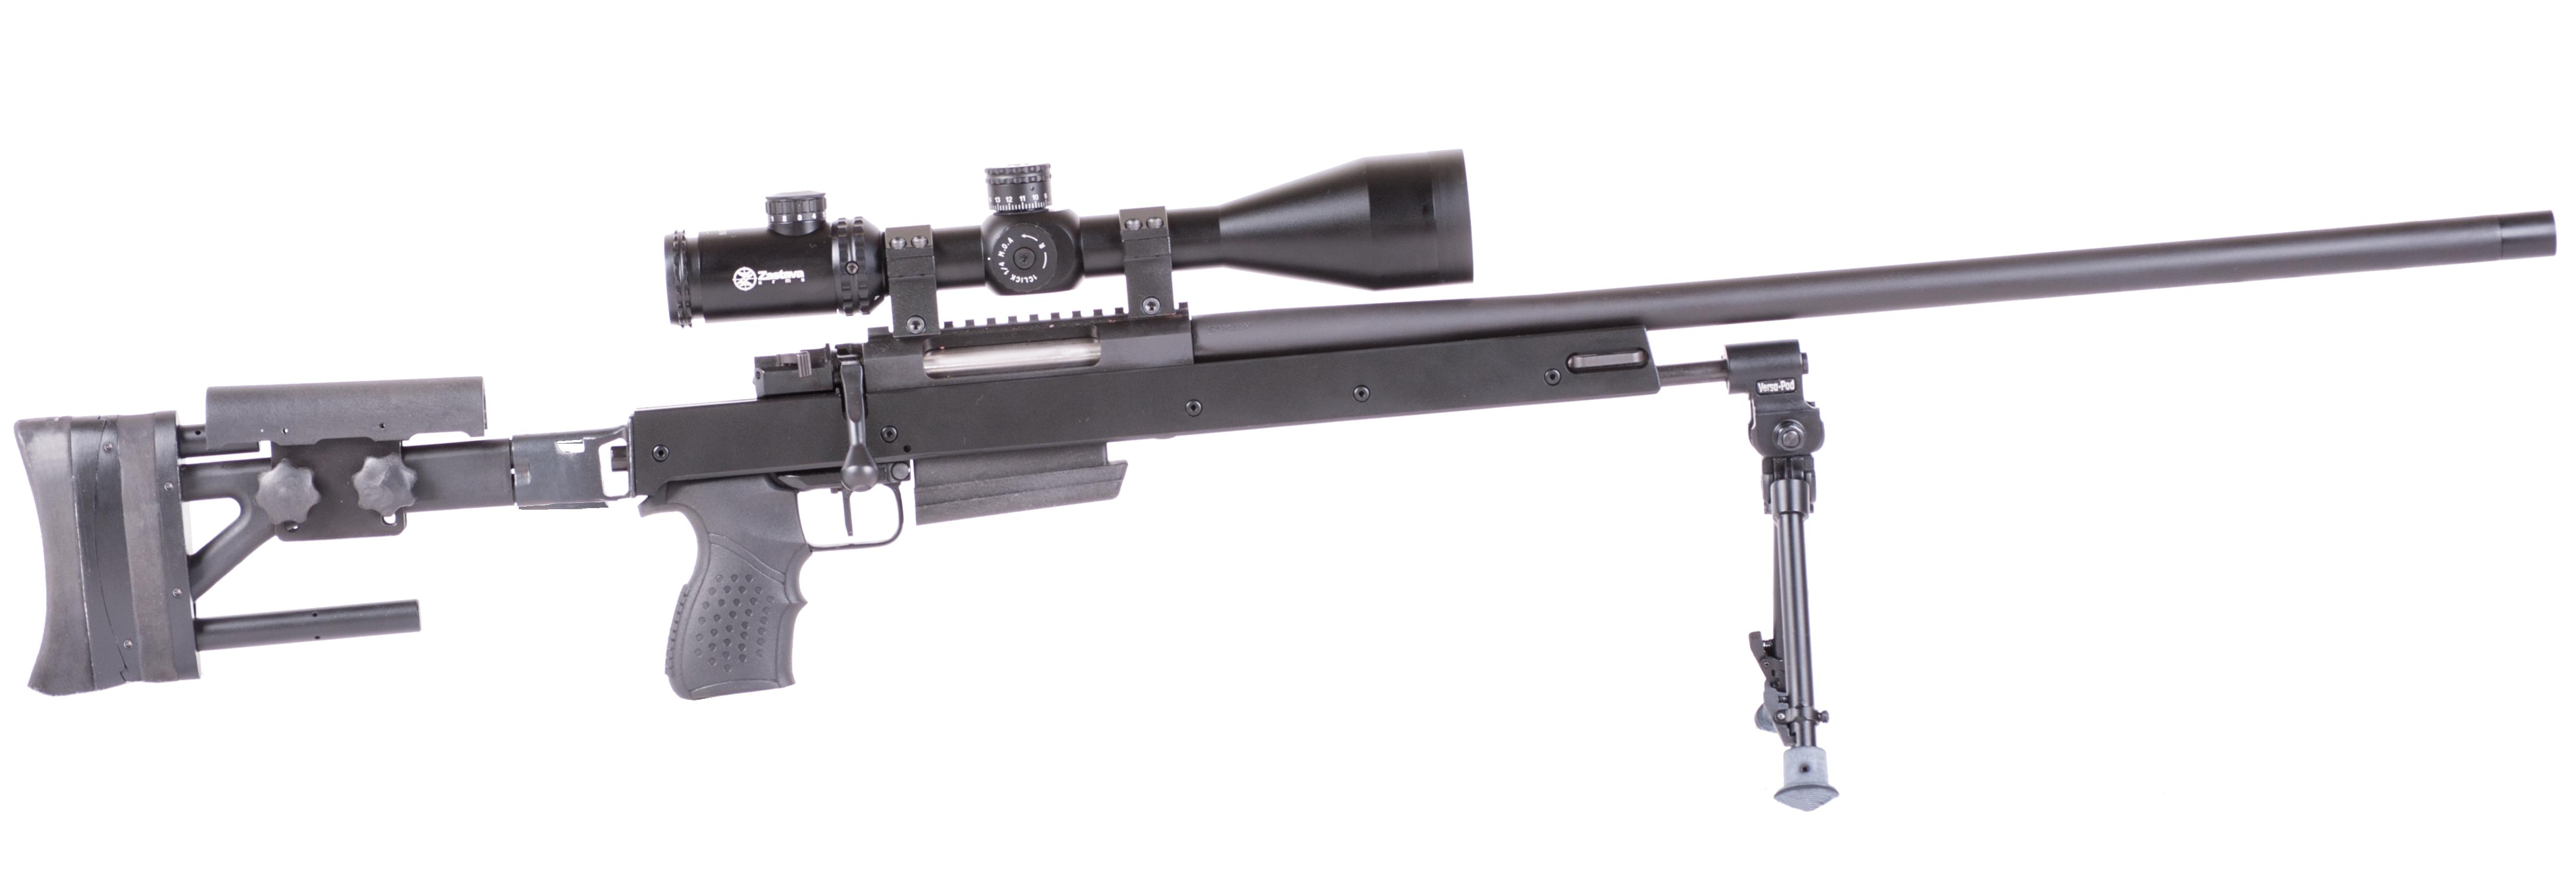 clipart stock Metal png image purepng. Transparent sniper.